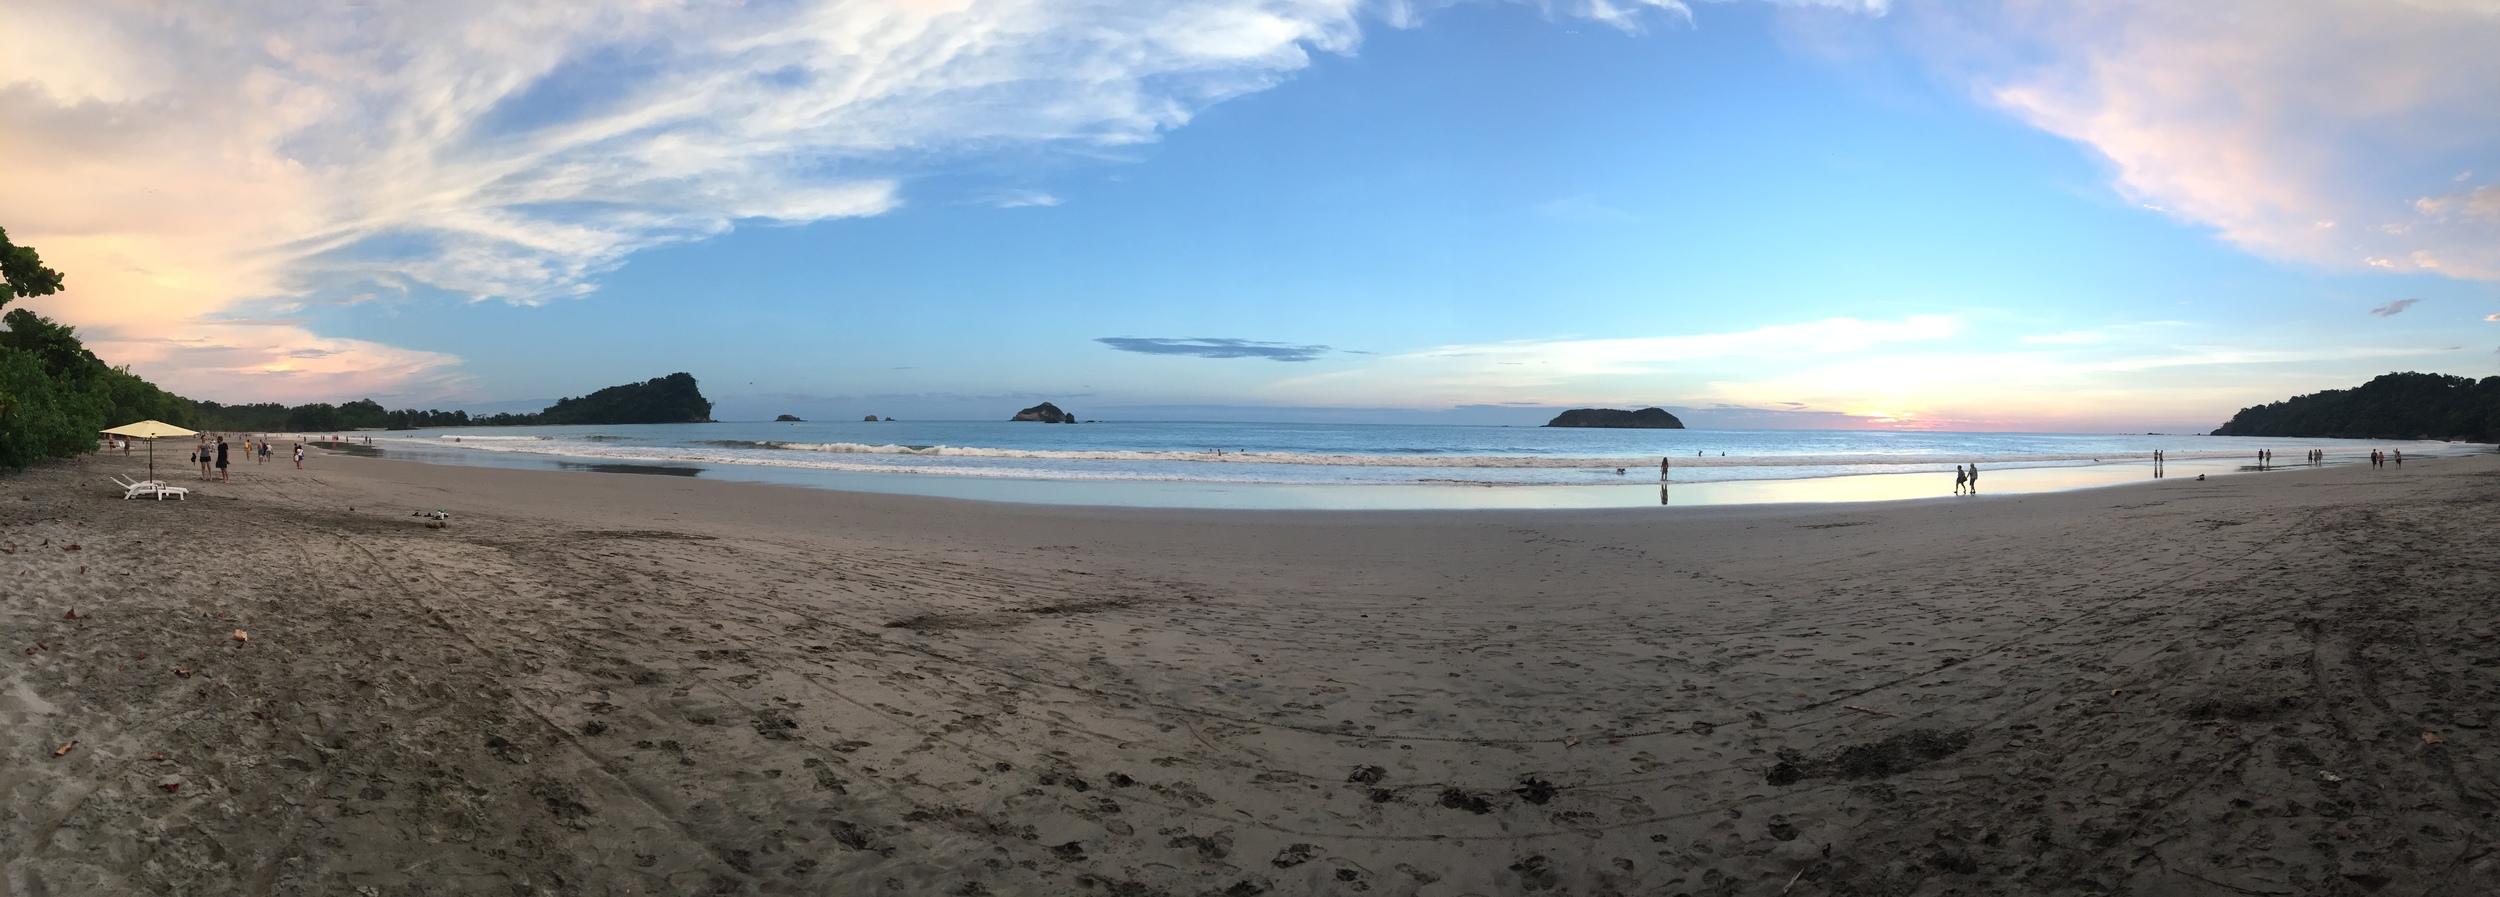 Sunset at Playitas Beach